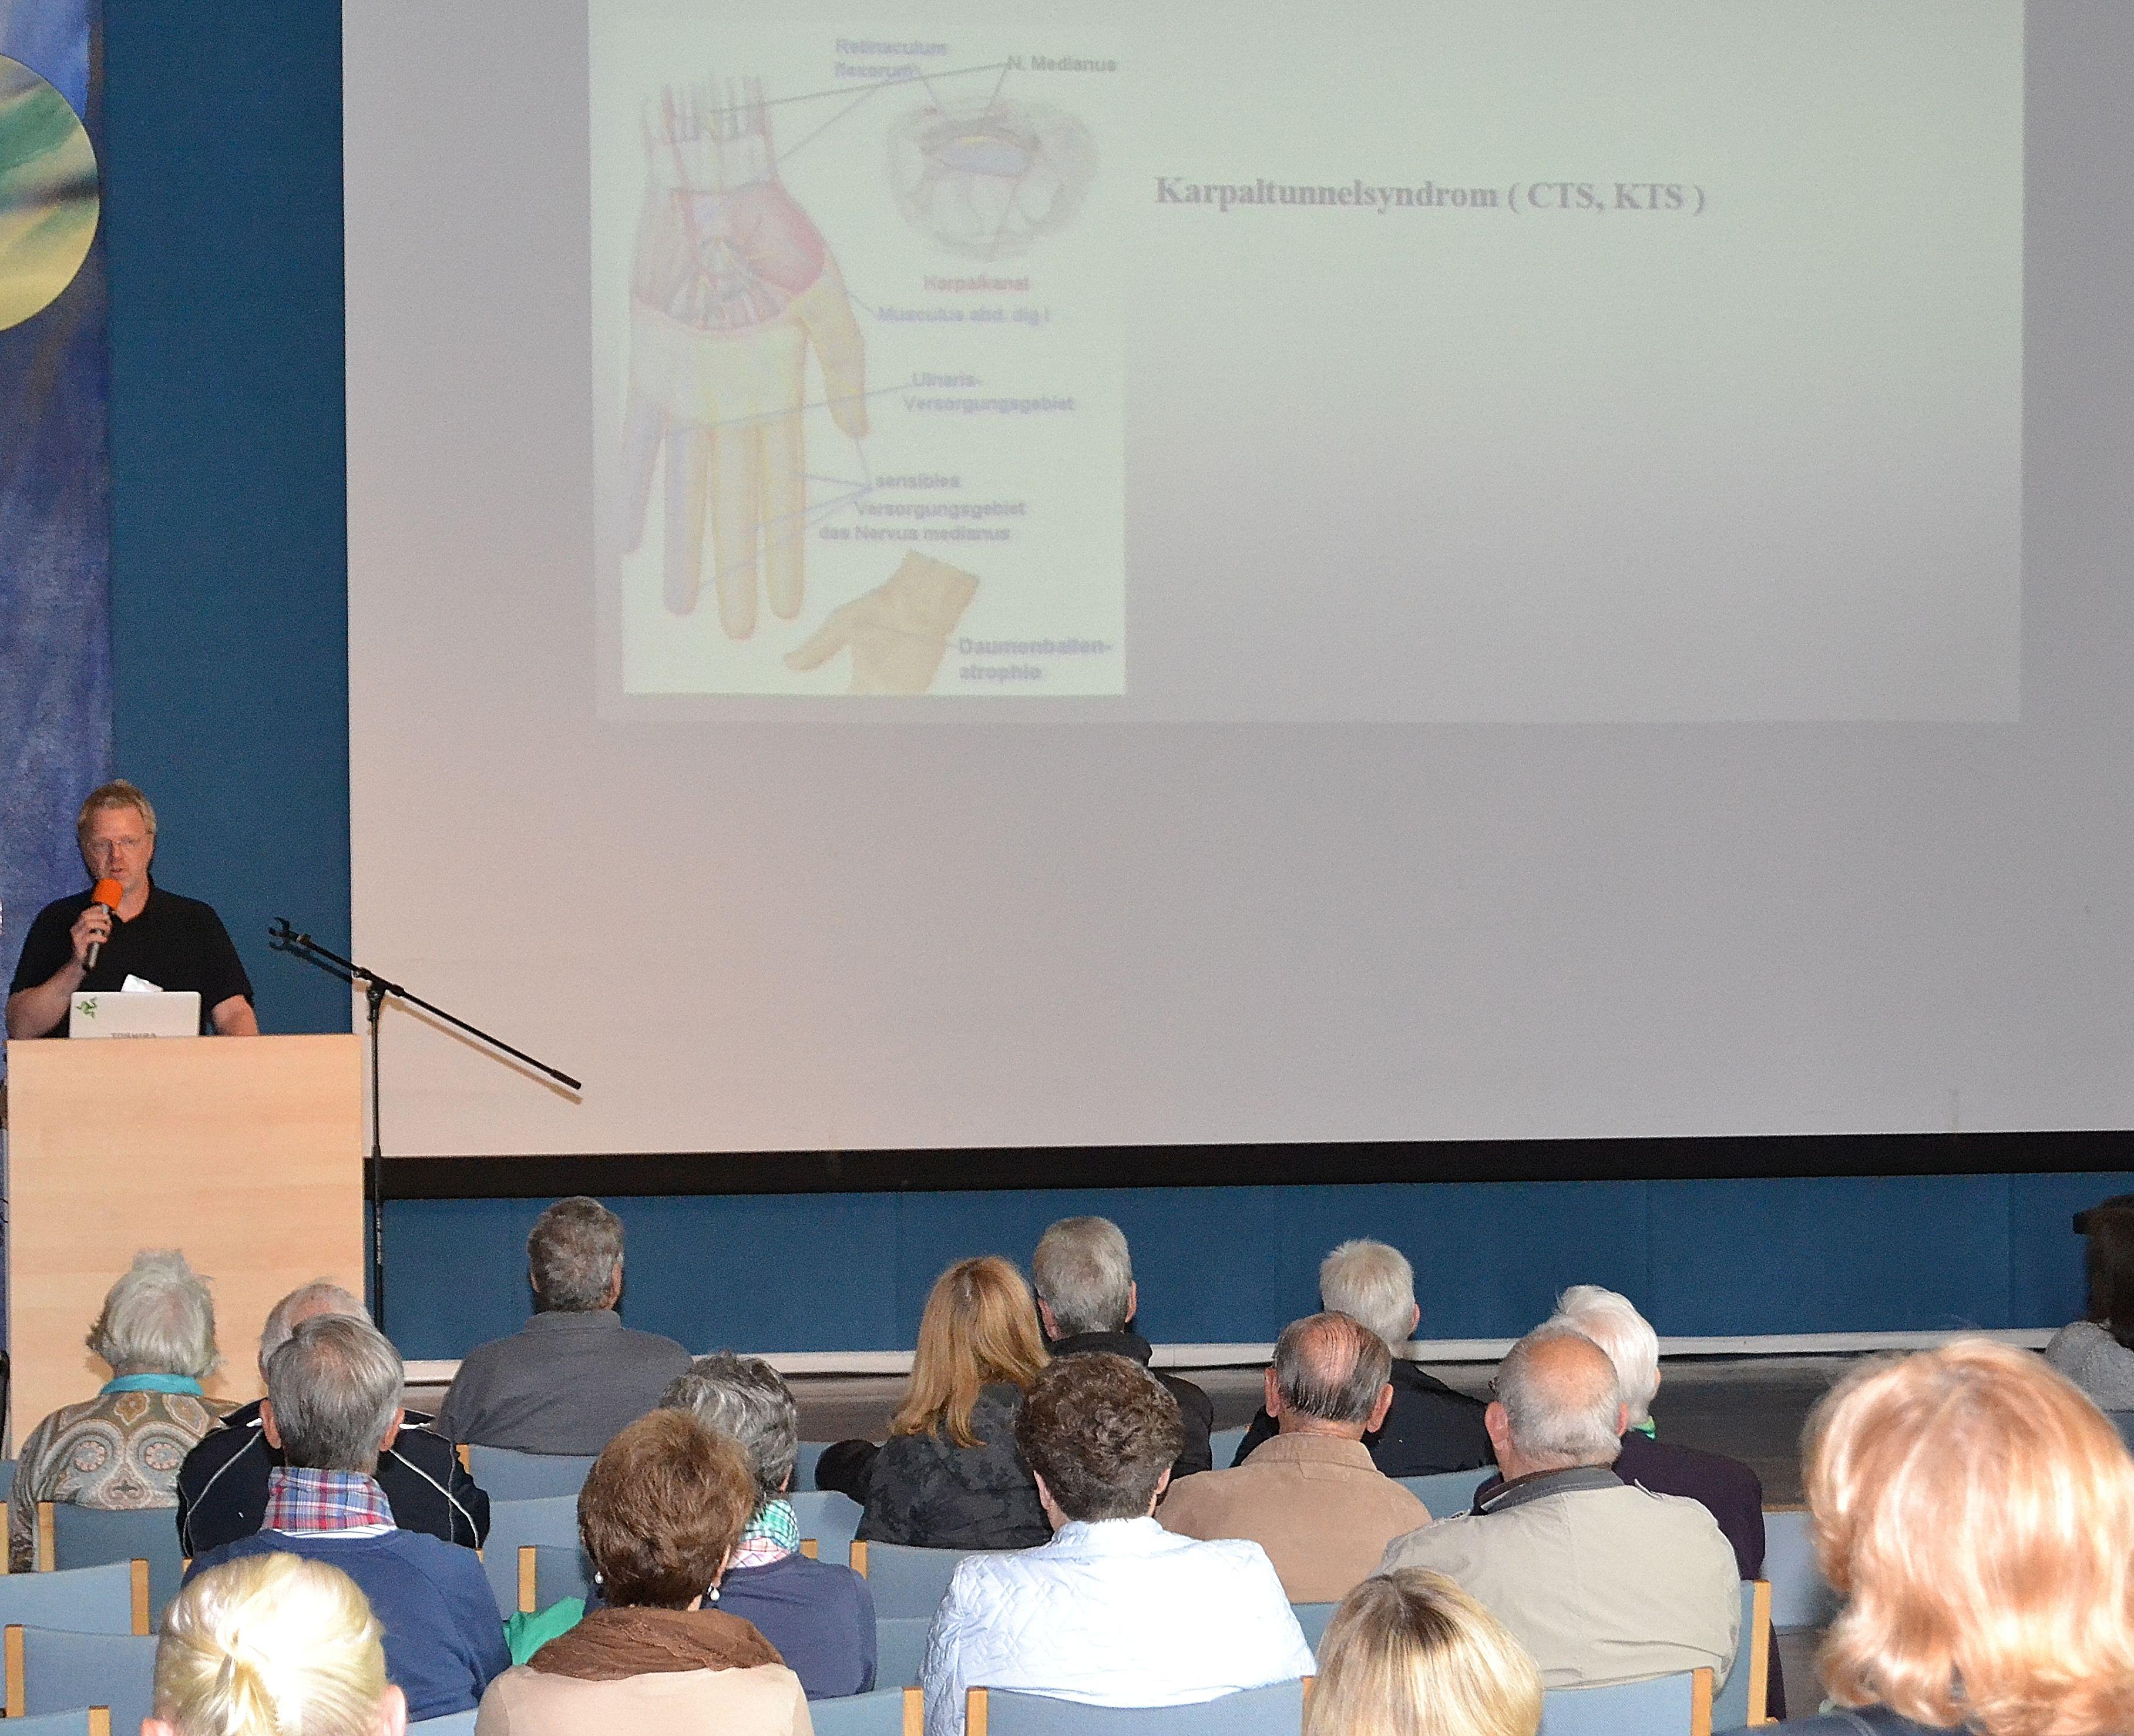 Dr. Michael Ptok informierte u.a. über das Karpaltunnelsyndrom